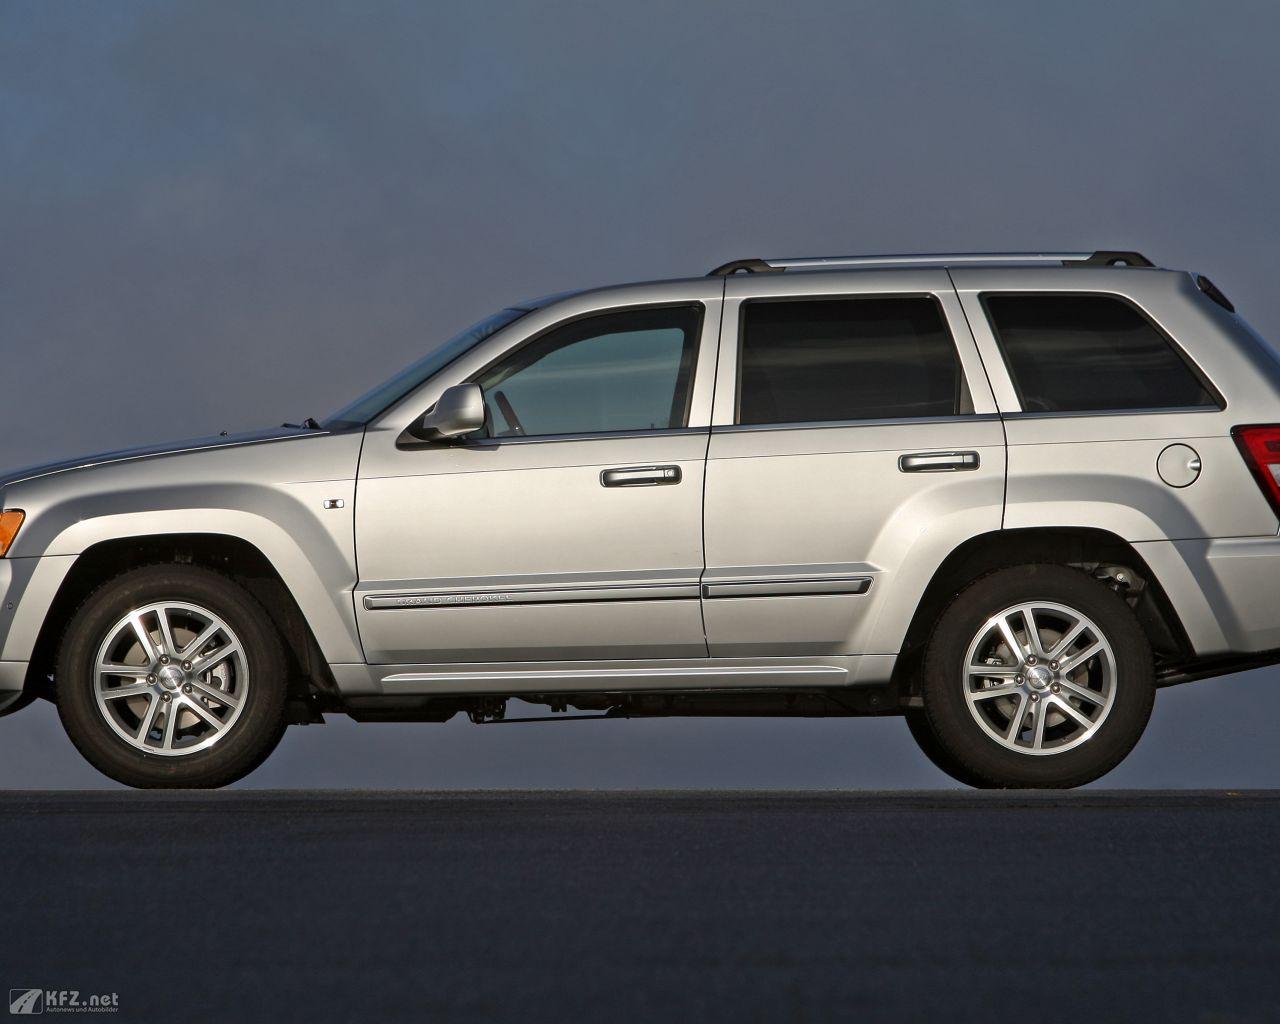 jeep-grand-cherokee-1280x1024-12